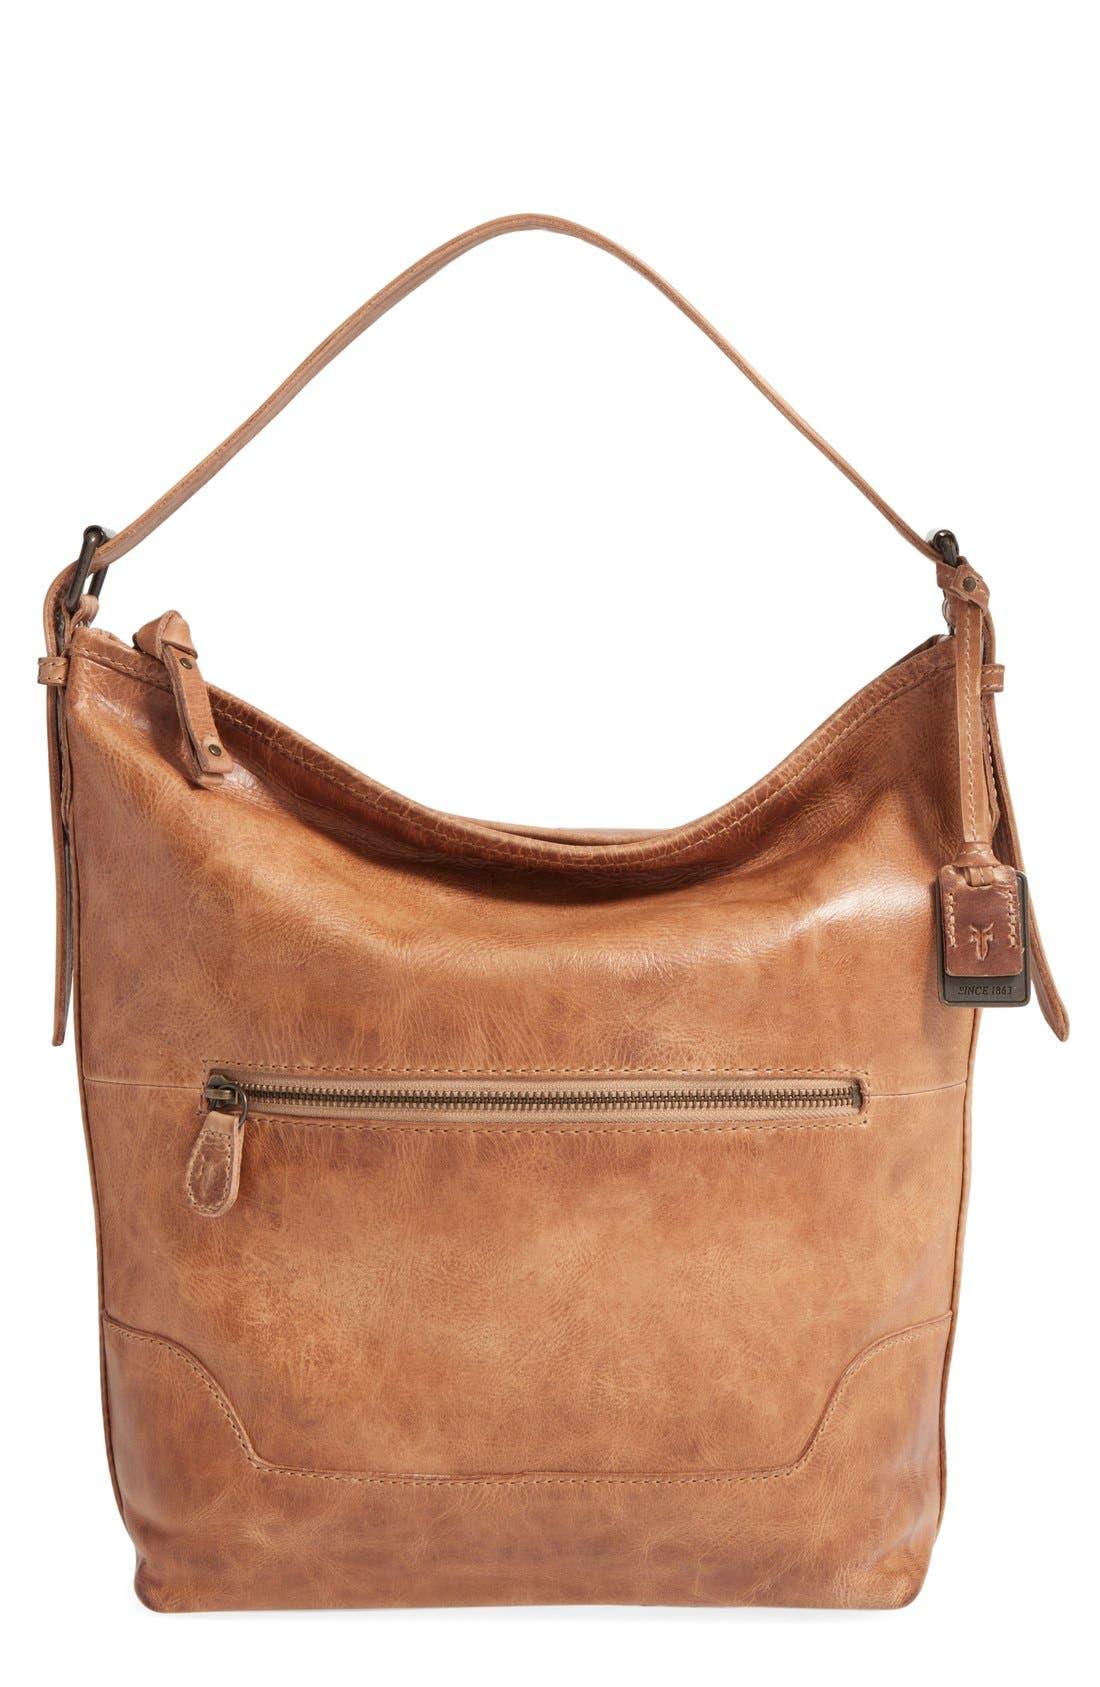 Alternate Image 1 Selected - Frye 'Melissa' Washed Leather Bucket Bag